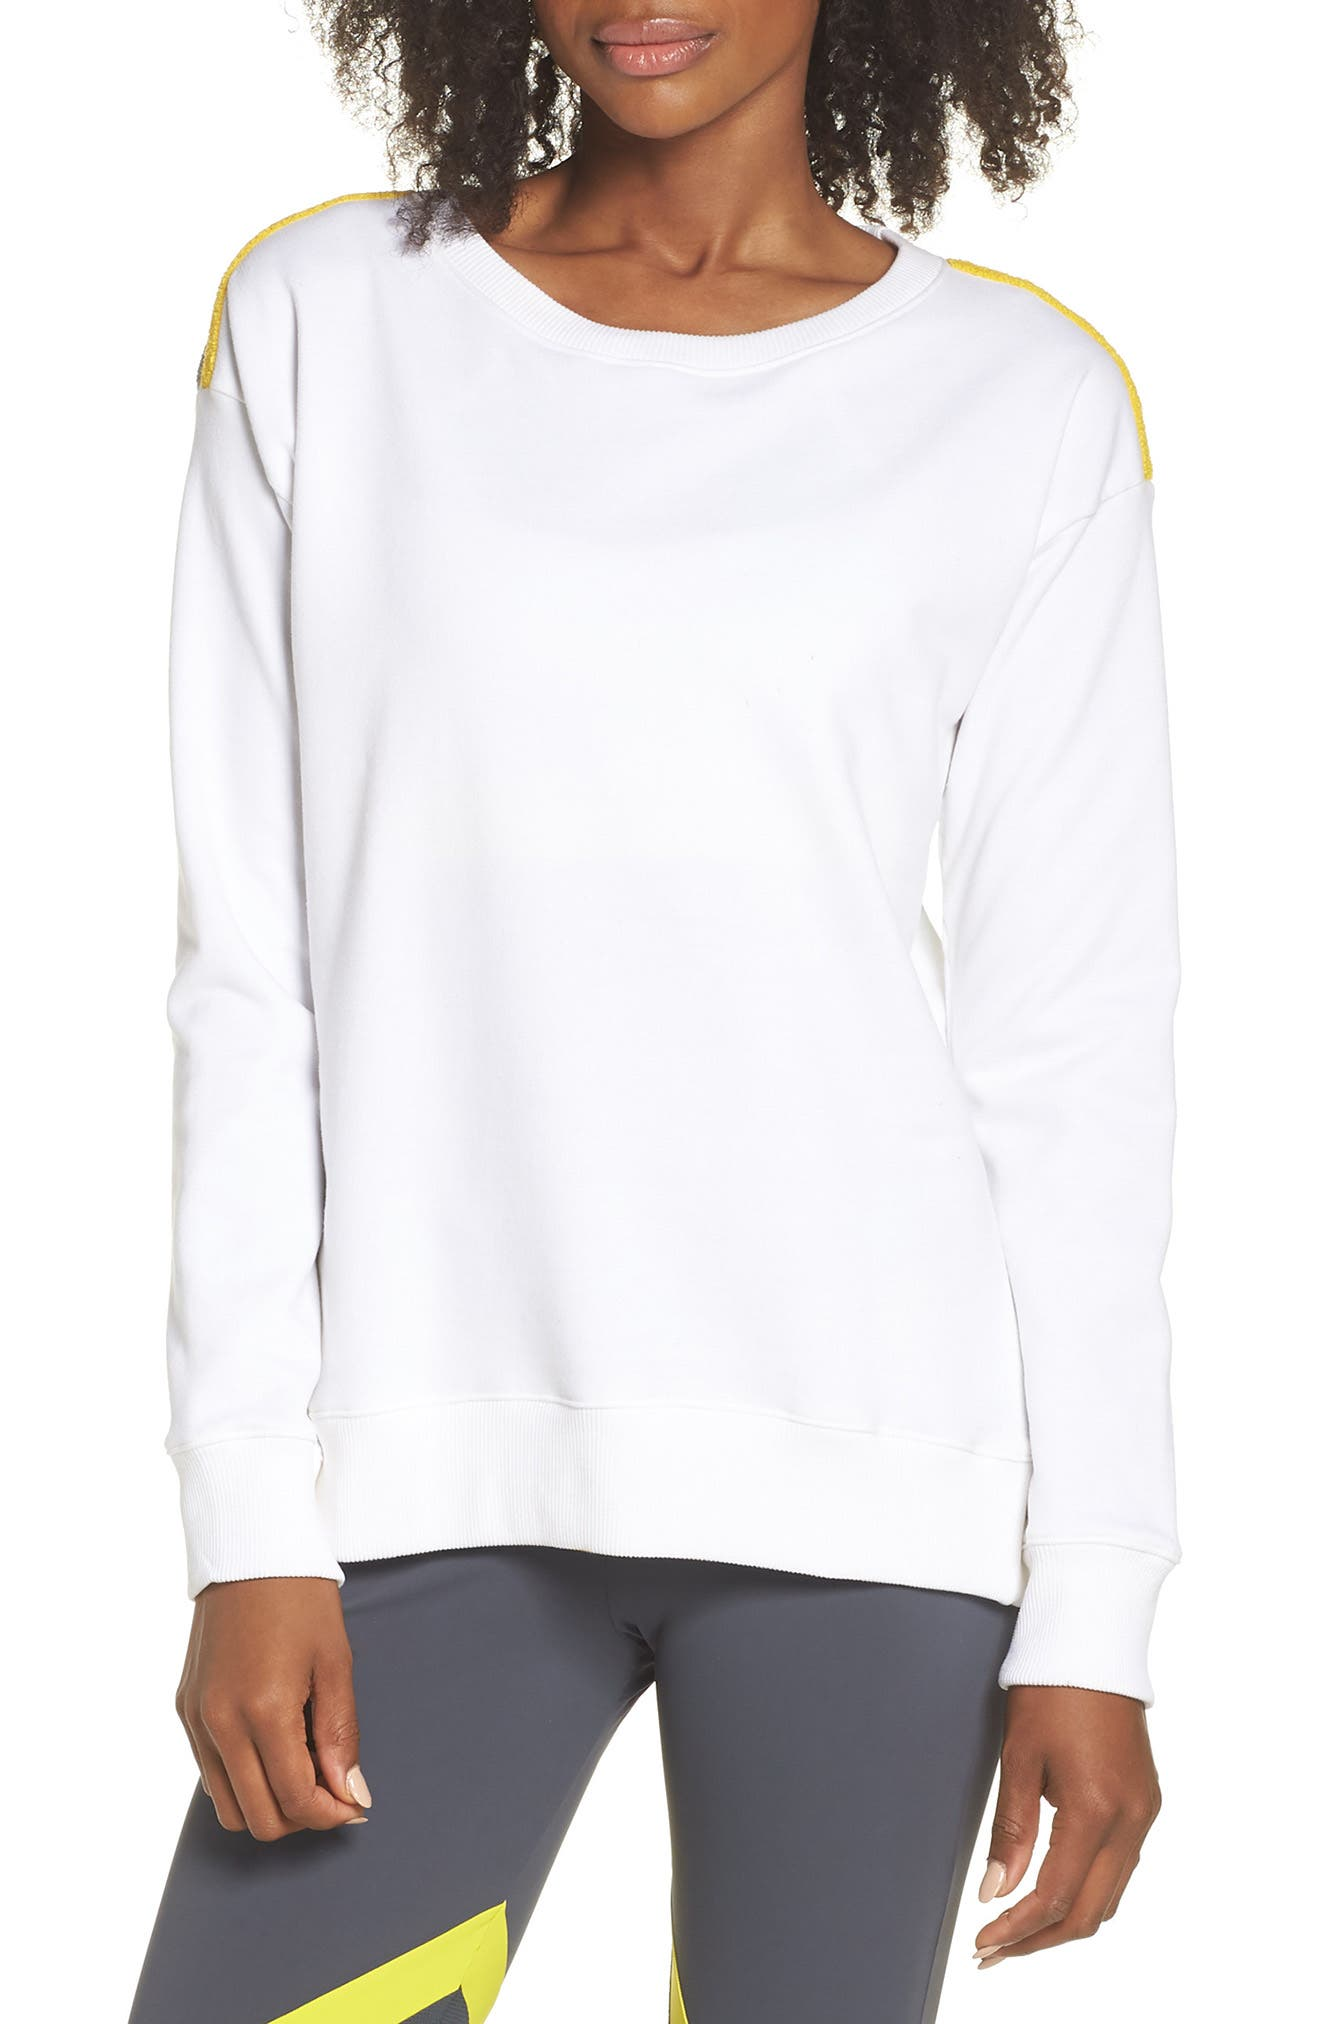 BoomBoom Athletica Tricolor Shoulder Sweatshirt,                         Main,                         color, WHITE/ GREY/ YELLOW